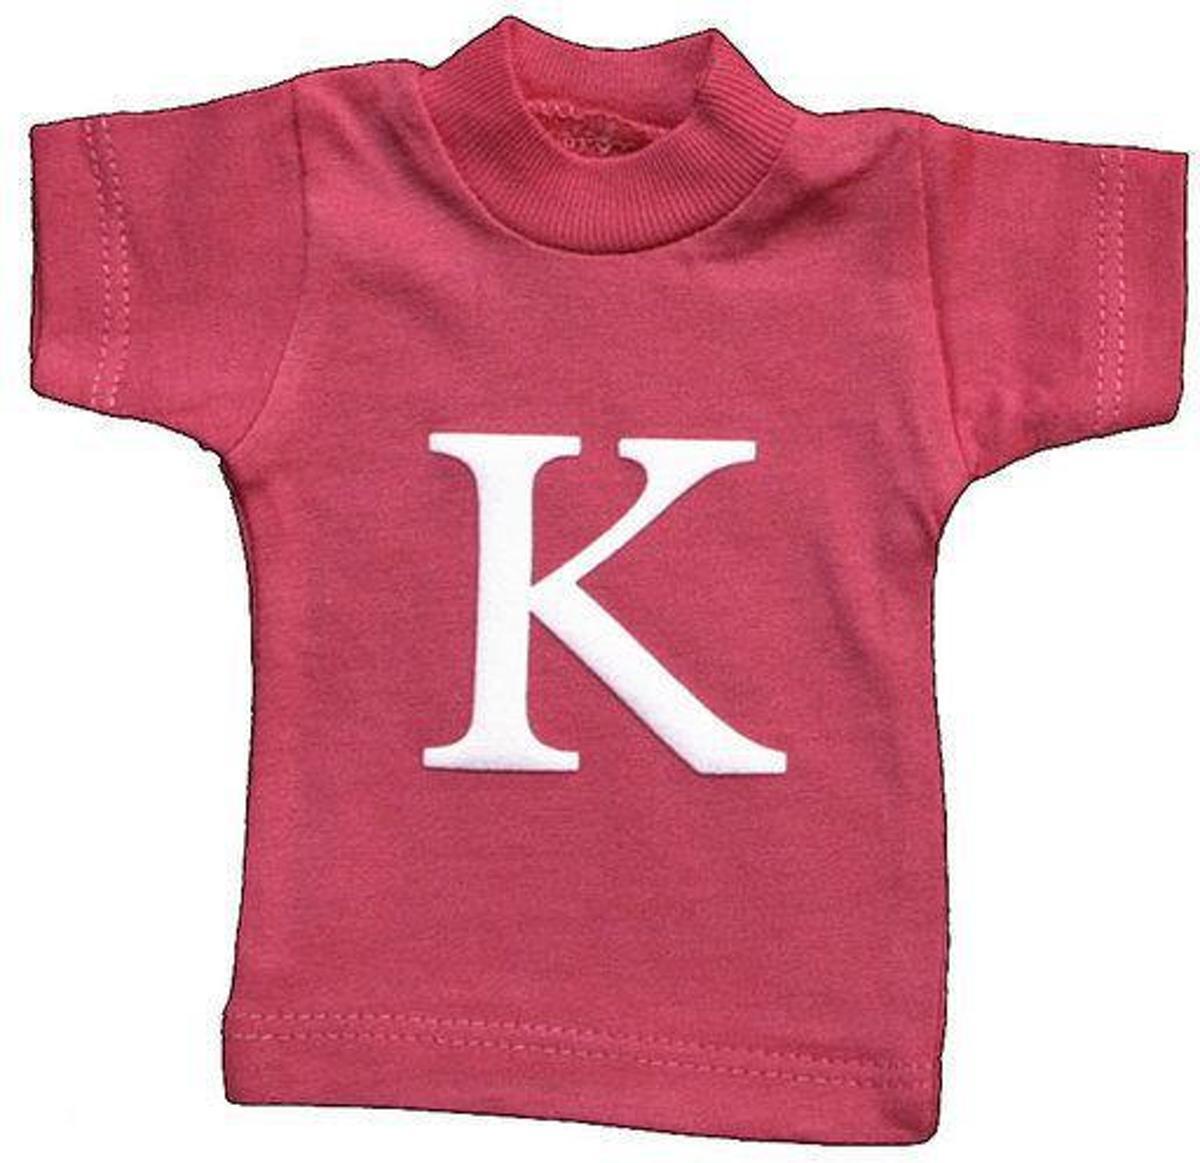 Lettershirts roze K